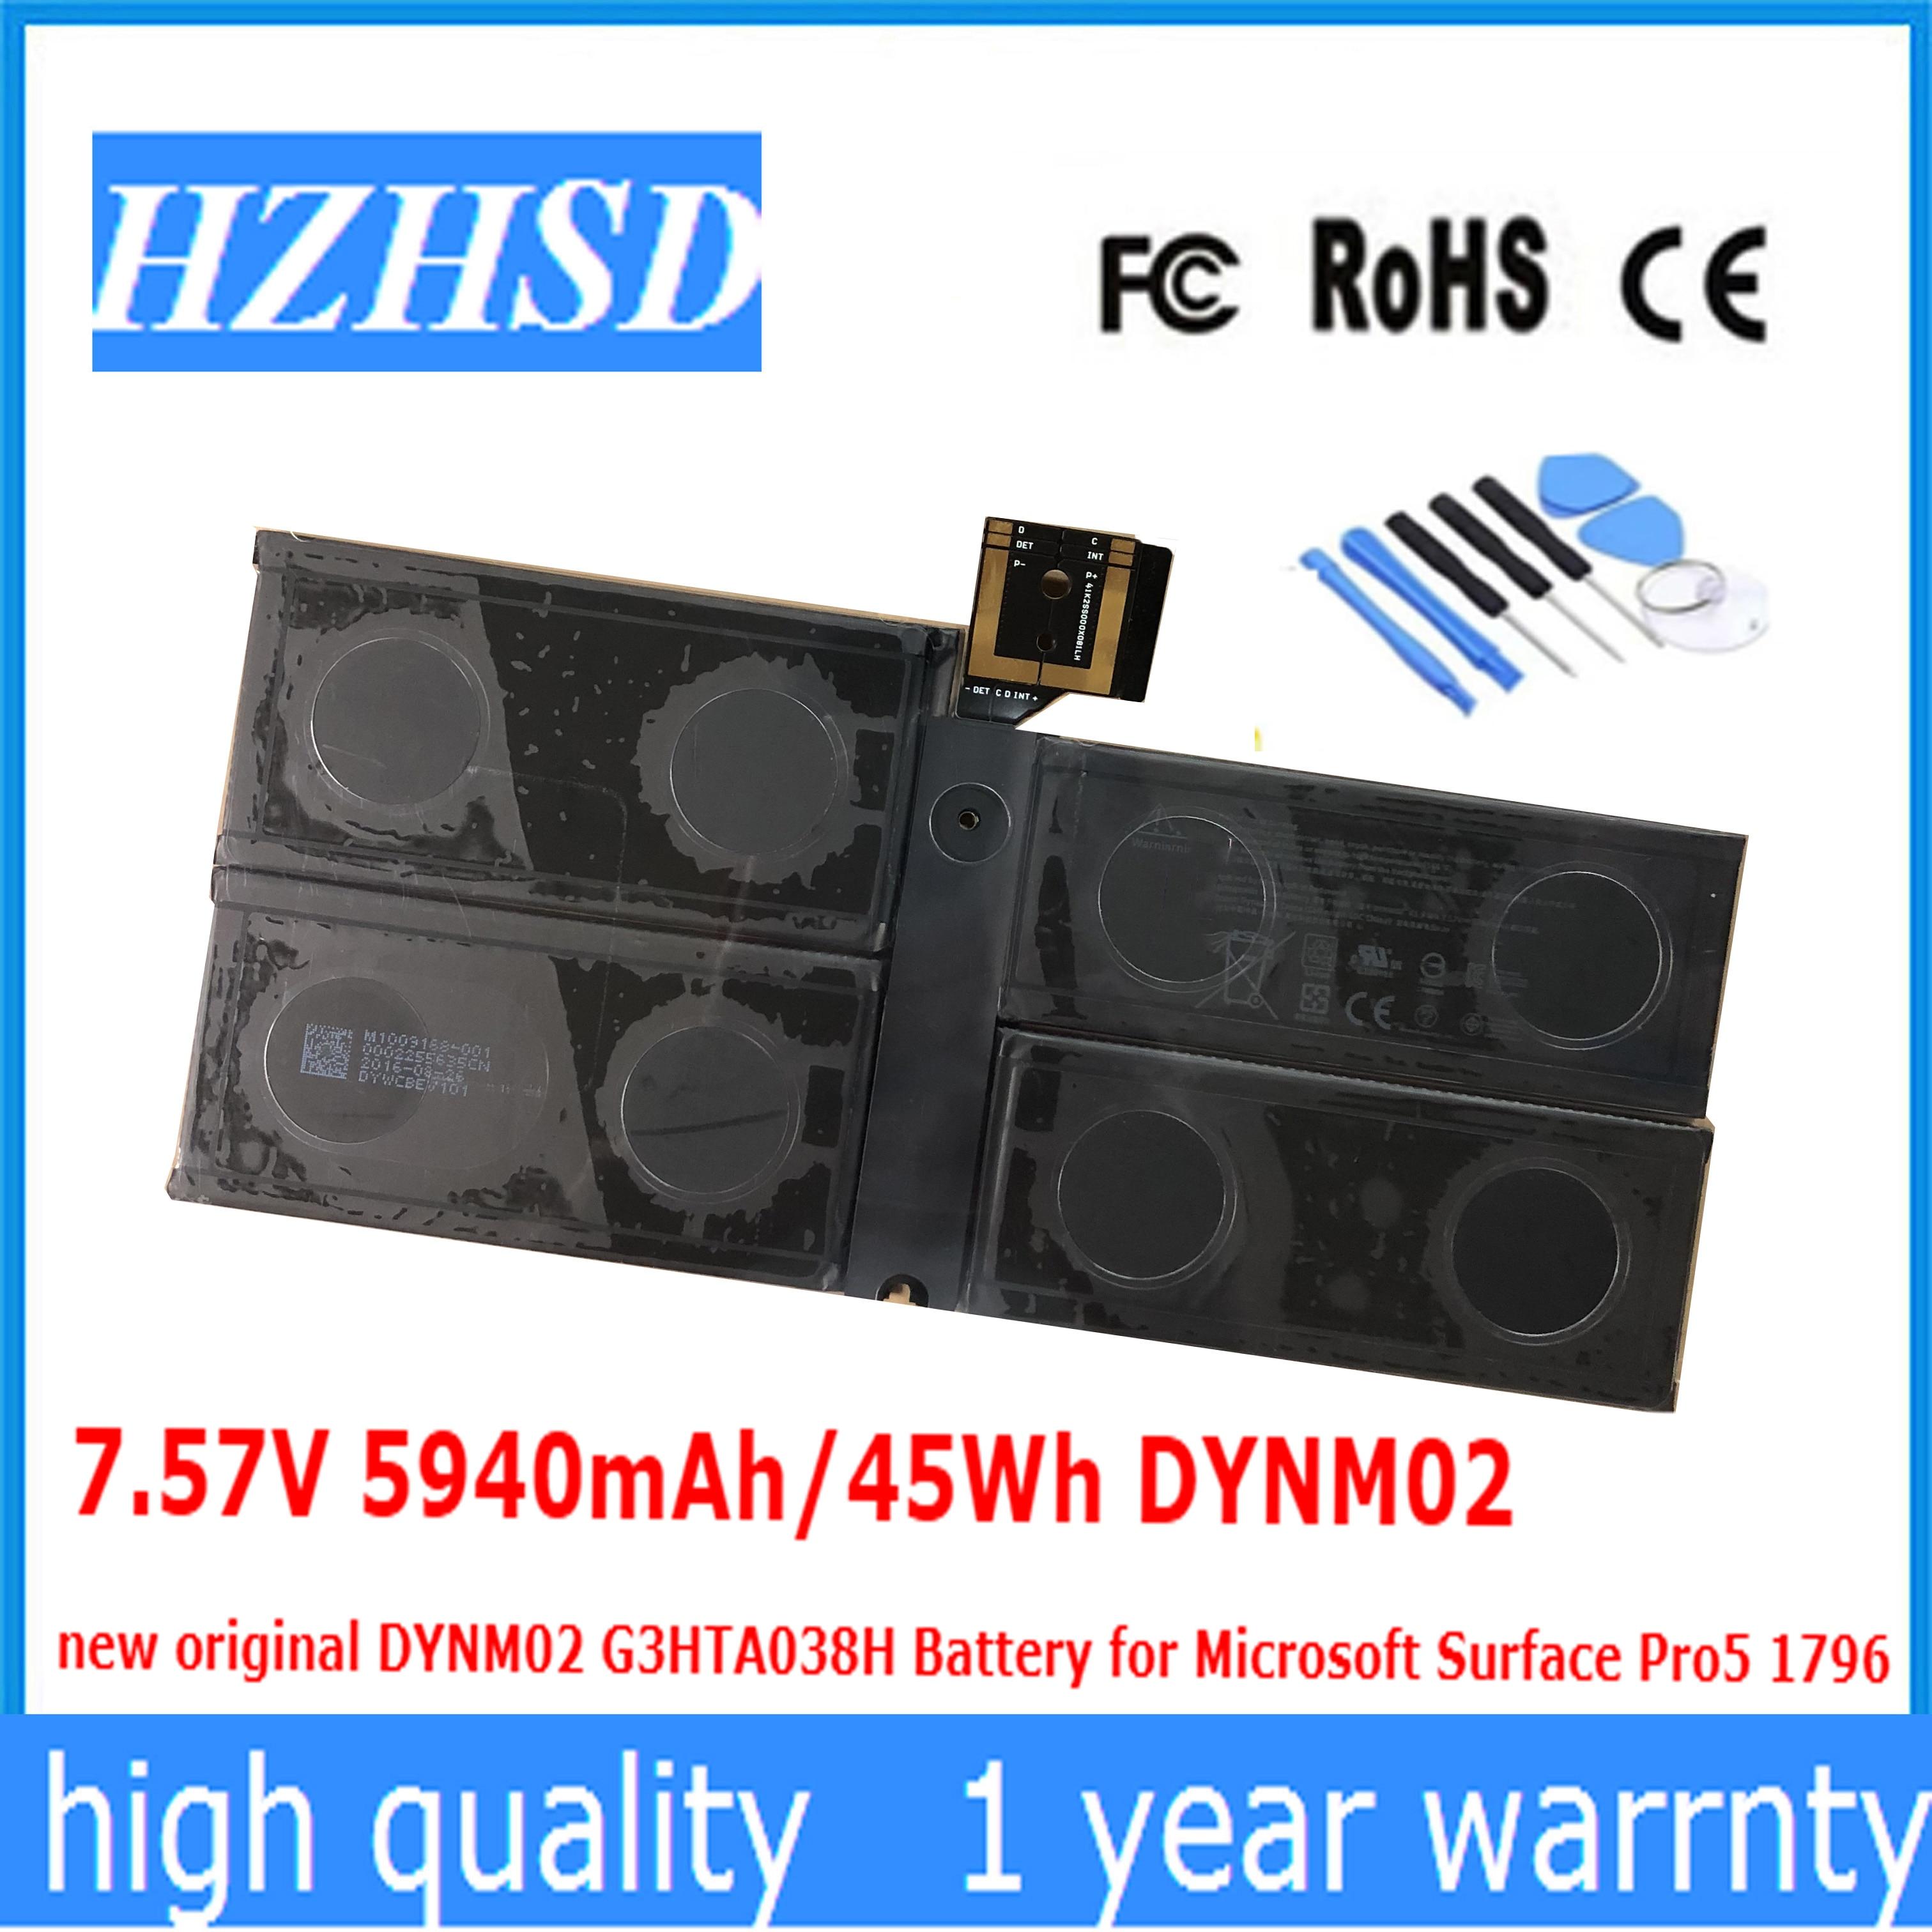 7.57V 5940mAh/45Wh DYNM02 New Original DYNM02 G3HTA038H Battery For Microsoft Surface Pro5 1796  PRO 5